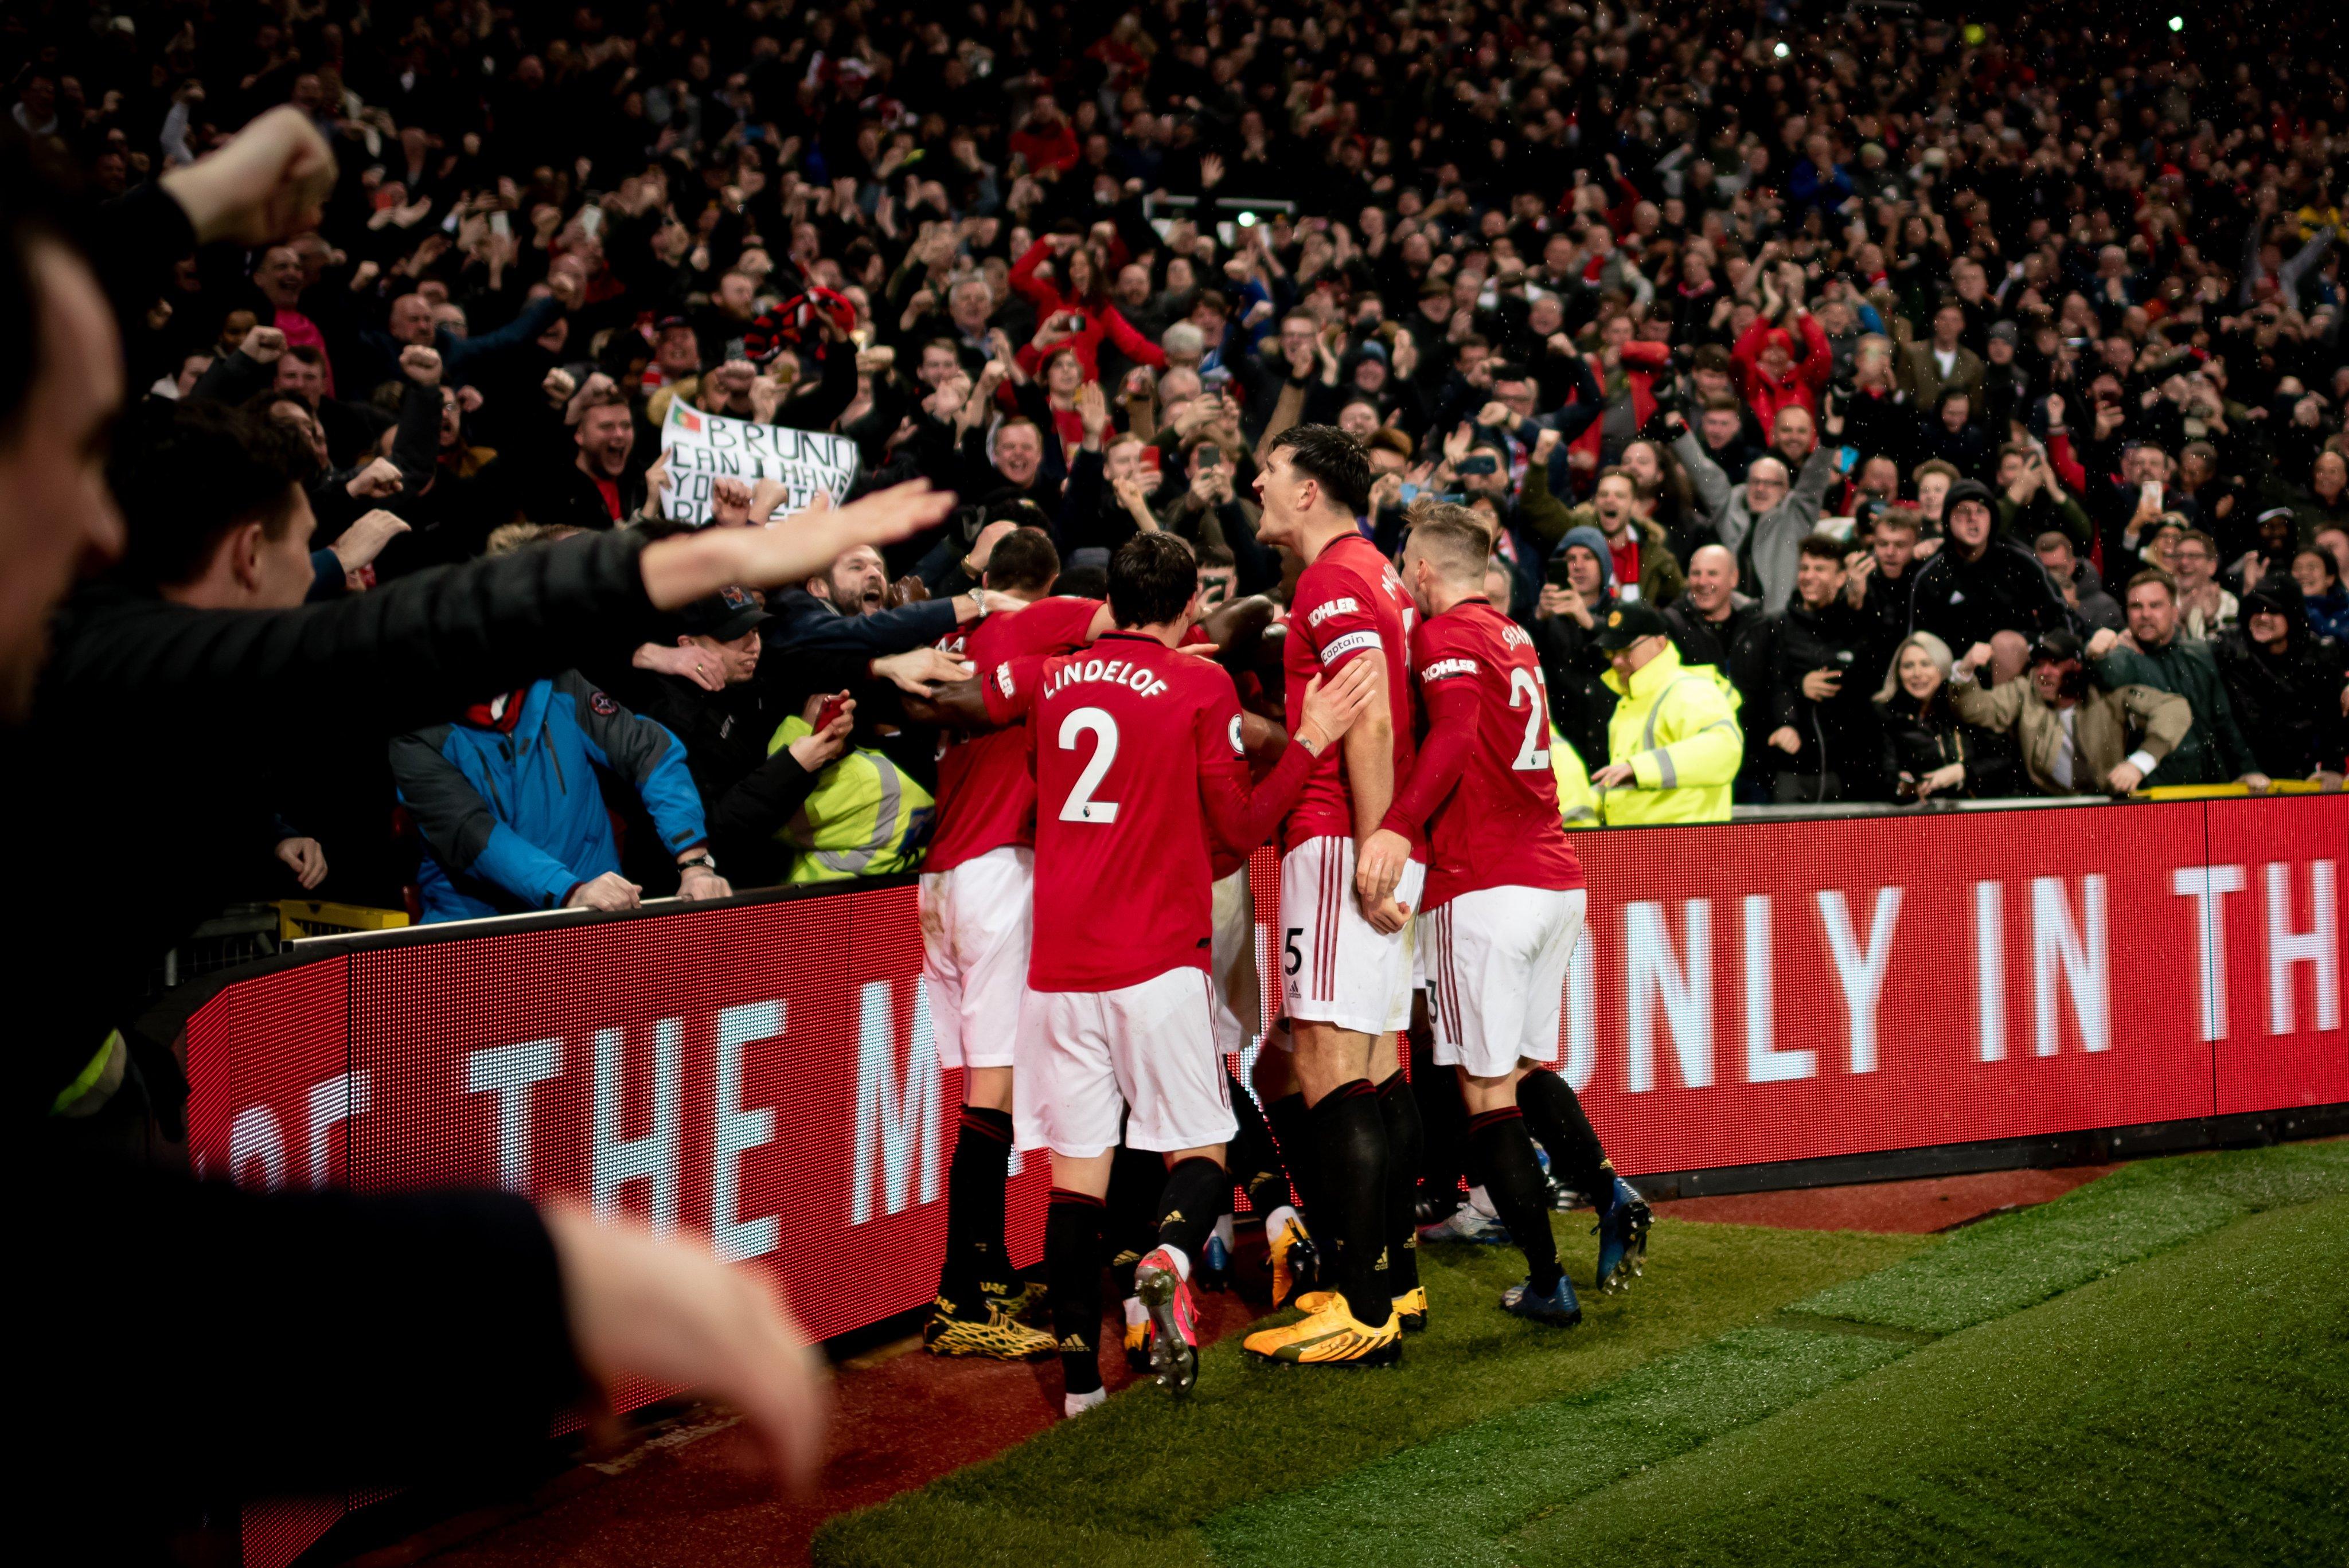 Манчестер Юнайтед - Манчестер Сити 2:0